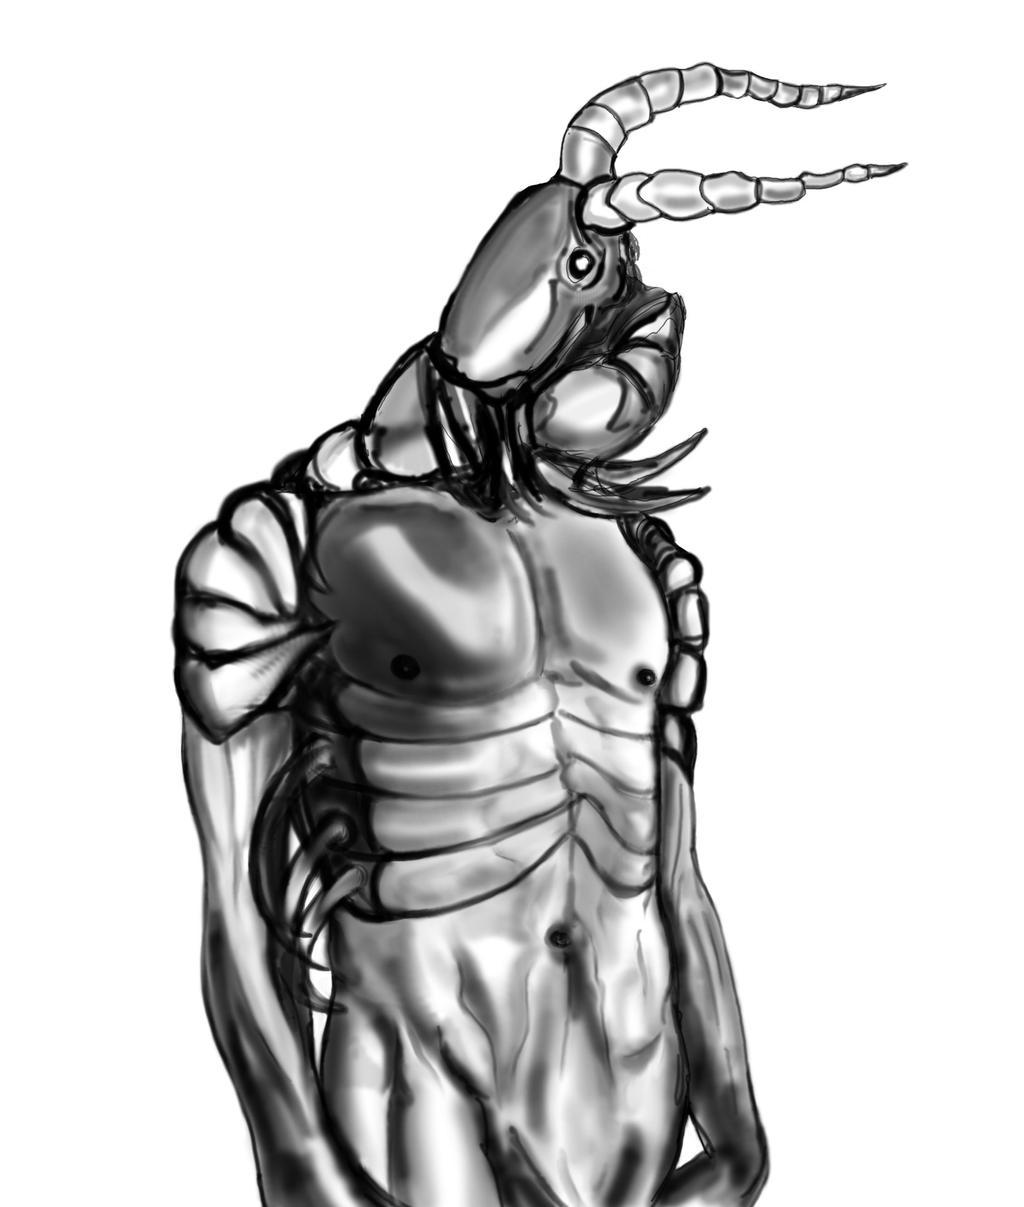 Human Centipede by dead01